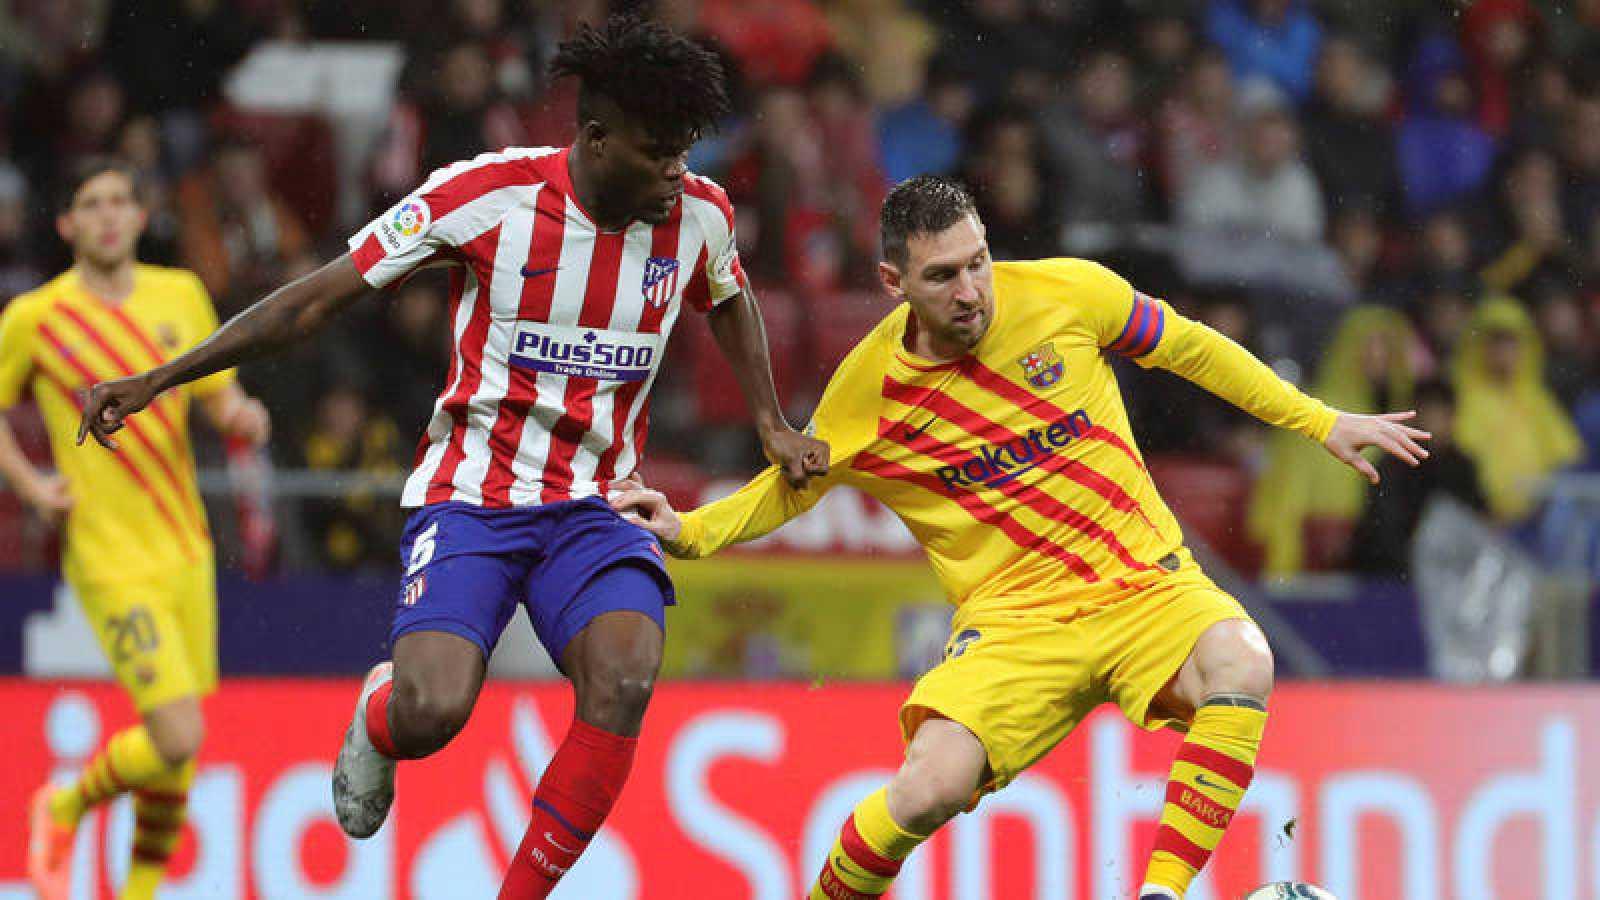 El centrocampista ghanés del Atlético de Madrid Thomas Partey (i) persigue a Leo Messi (d), delantero argentino del FC Barcelona